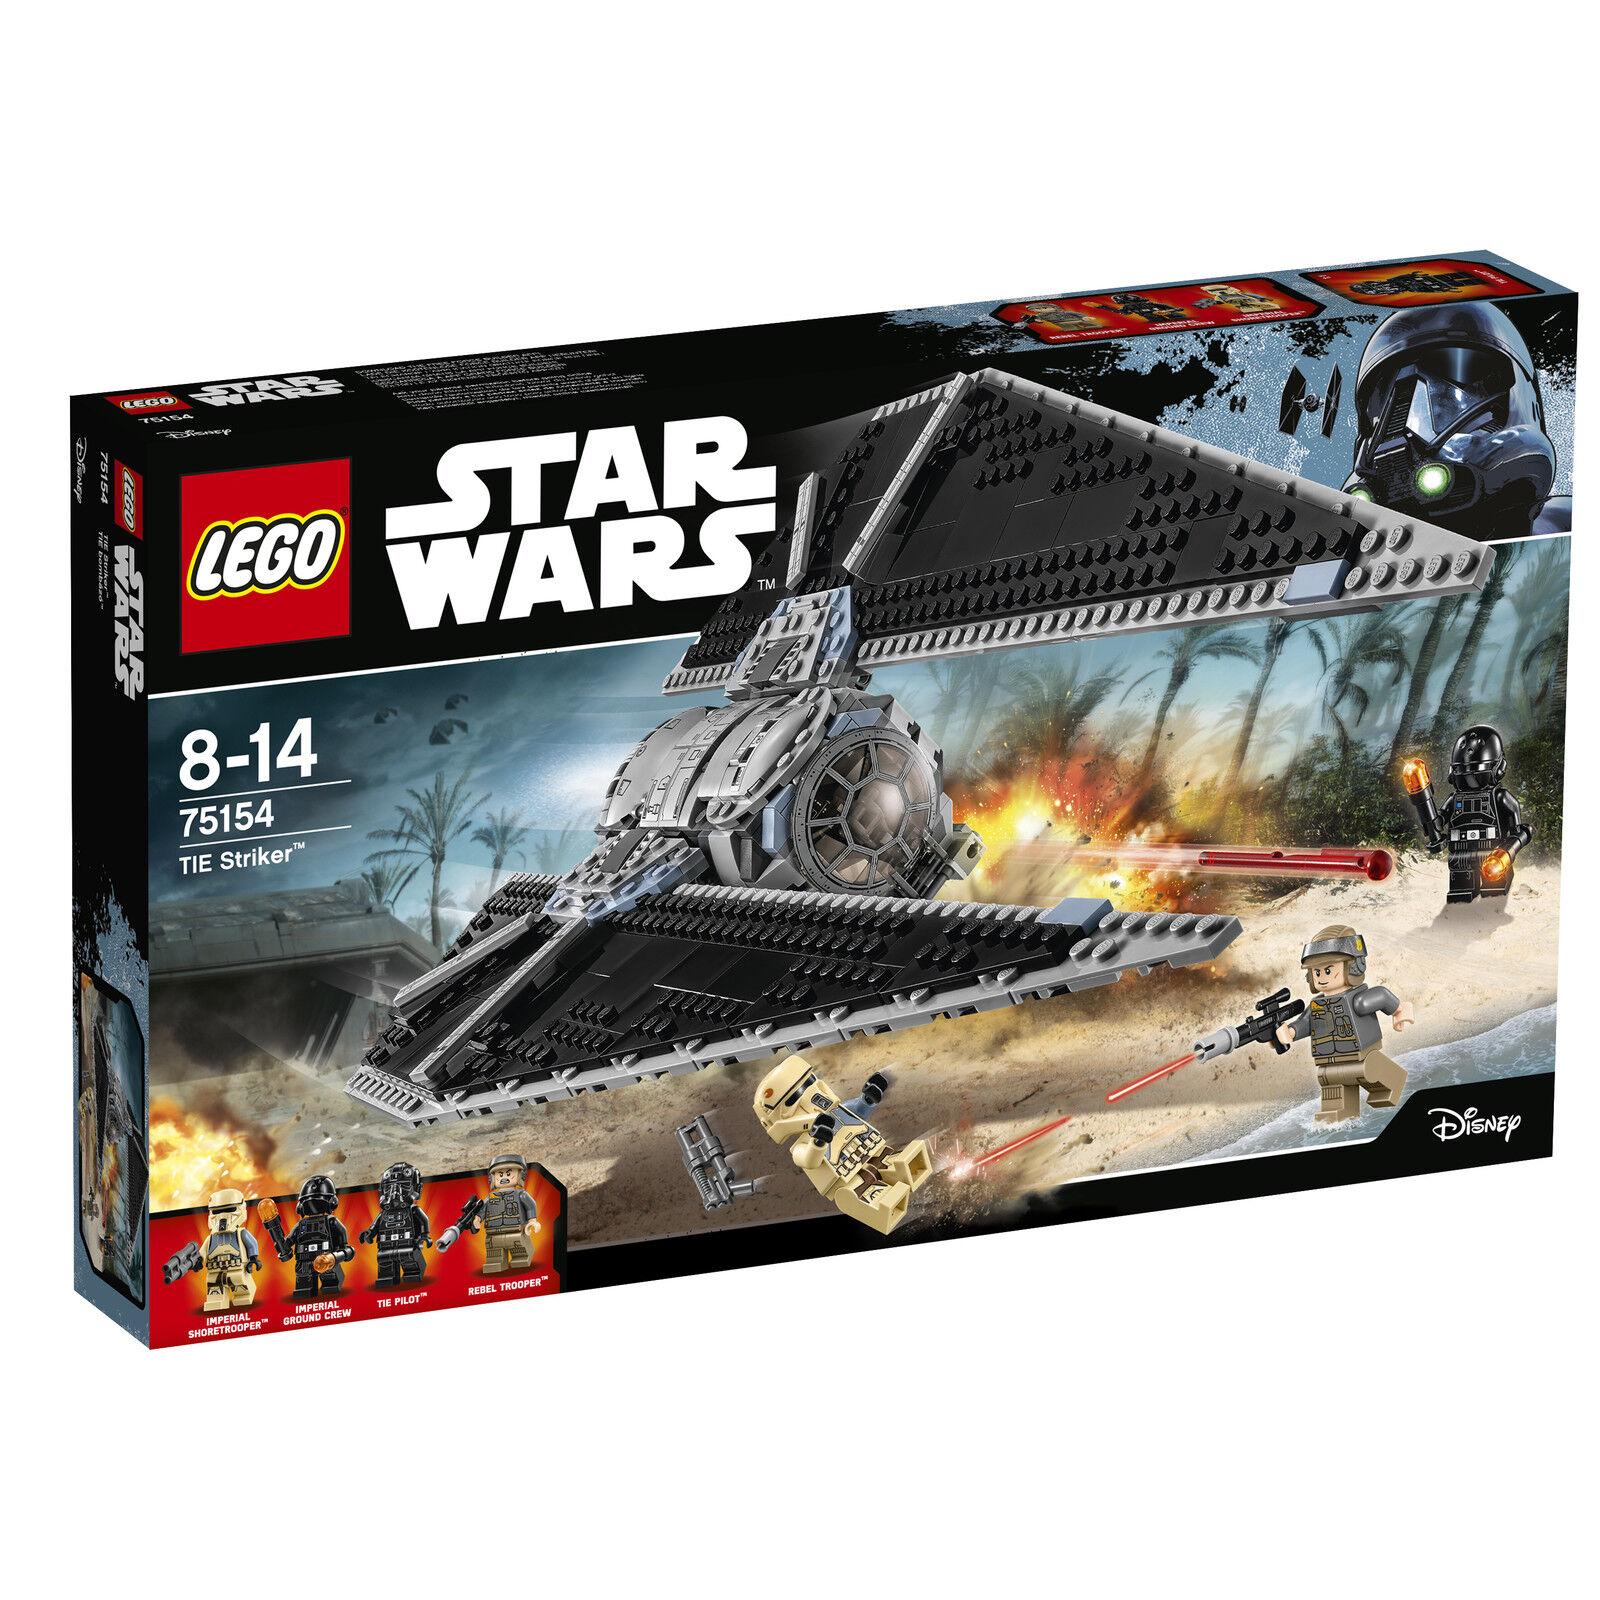 LEGO STAR WARS - 75154 - TIE STRIKER - BRAND BRAND BRAND NEW & FACTORY SEALED 8b886f